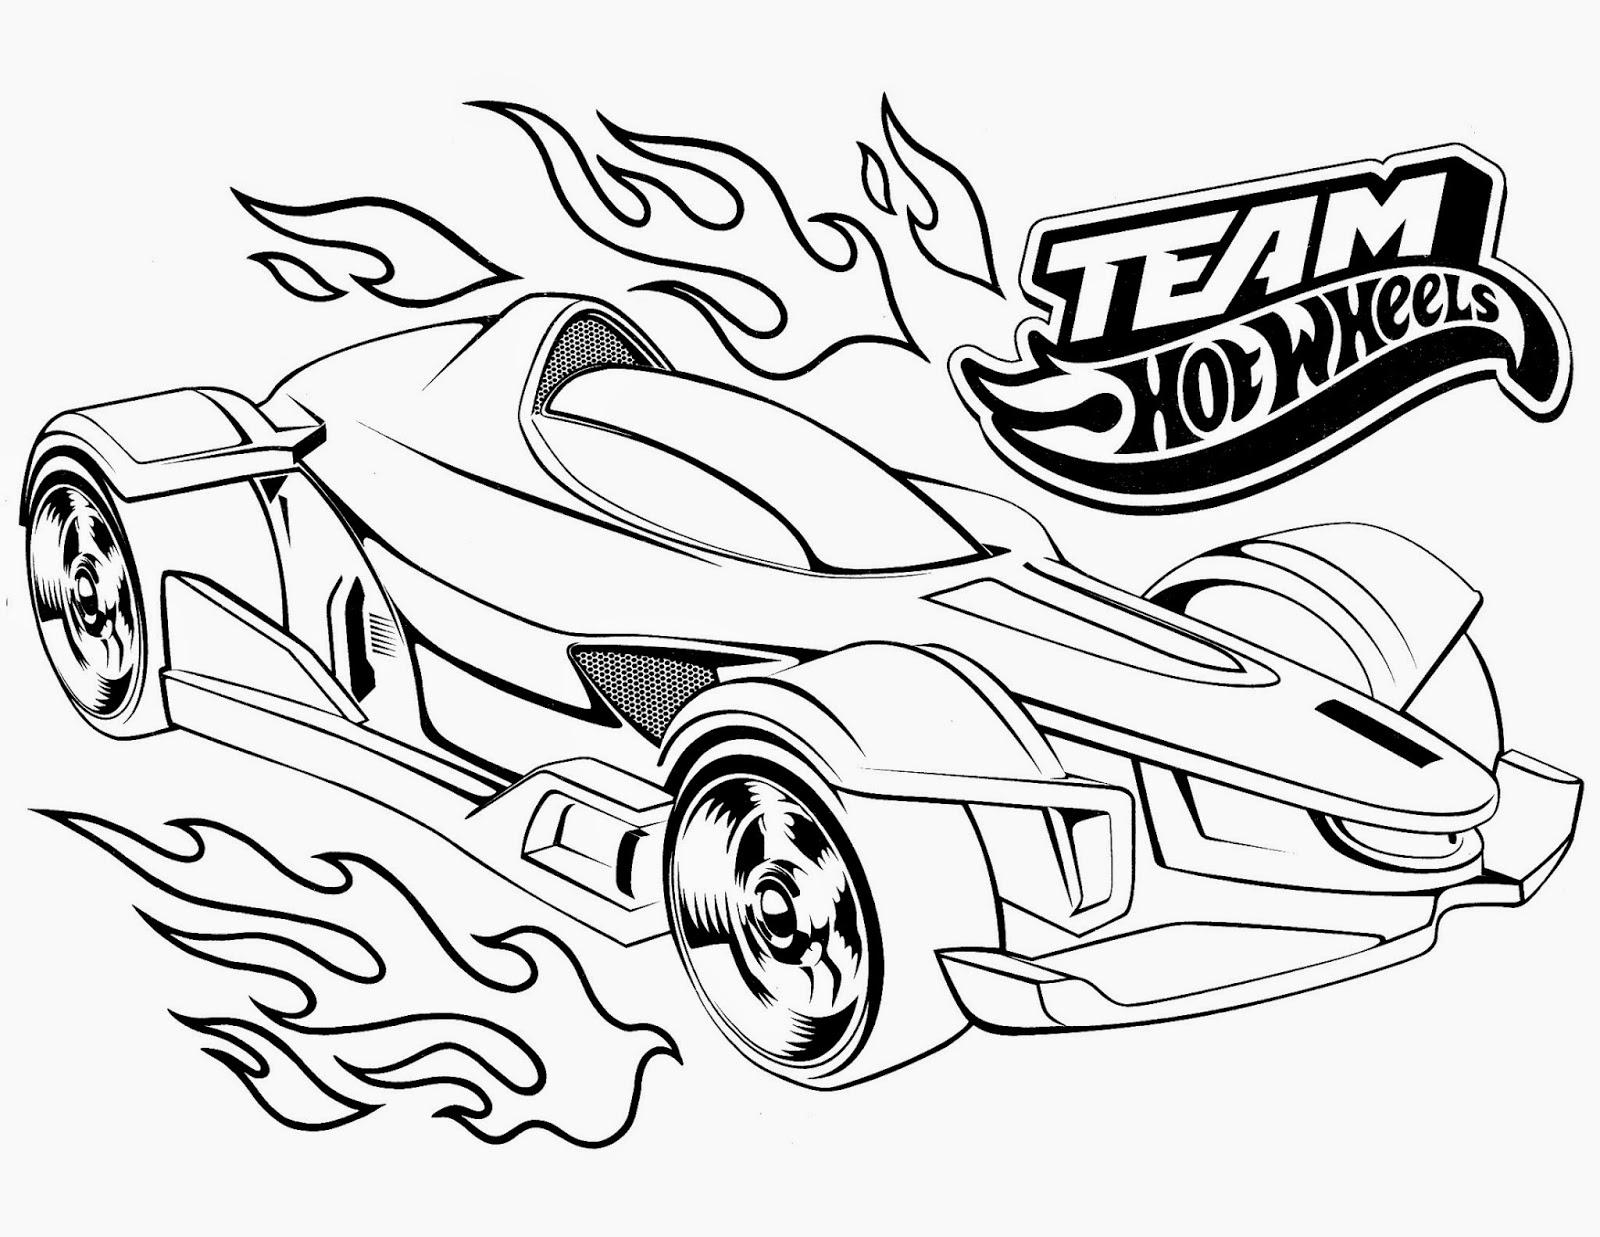 Racing Car Drawing at GetDrawings.com | Free for personal use Racing ...